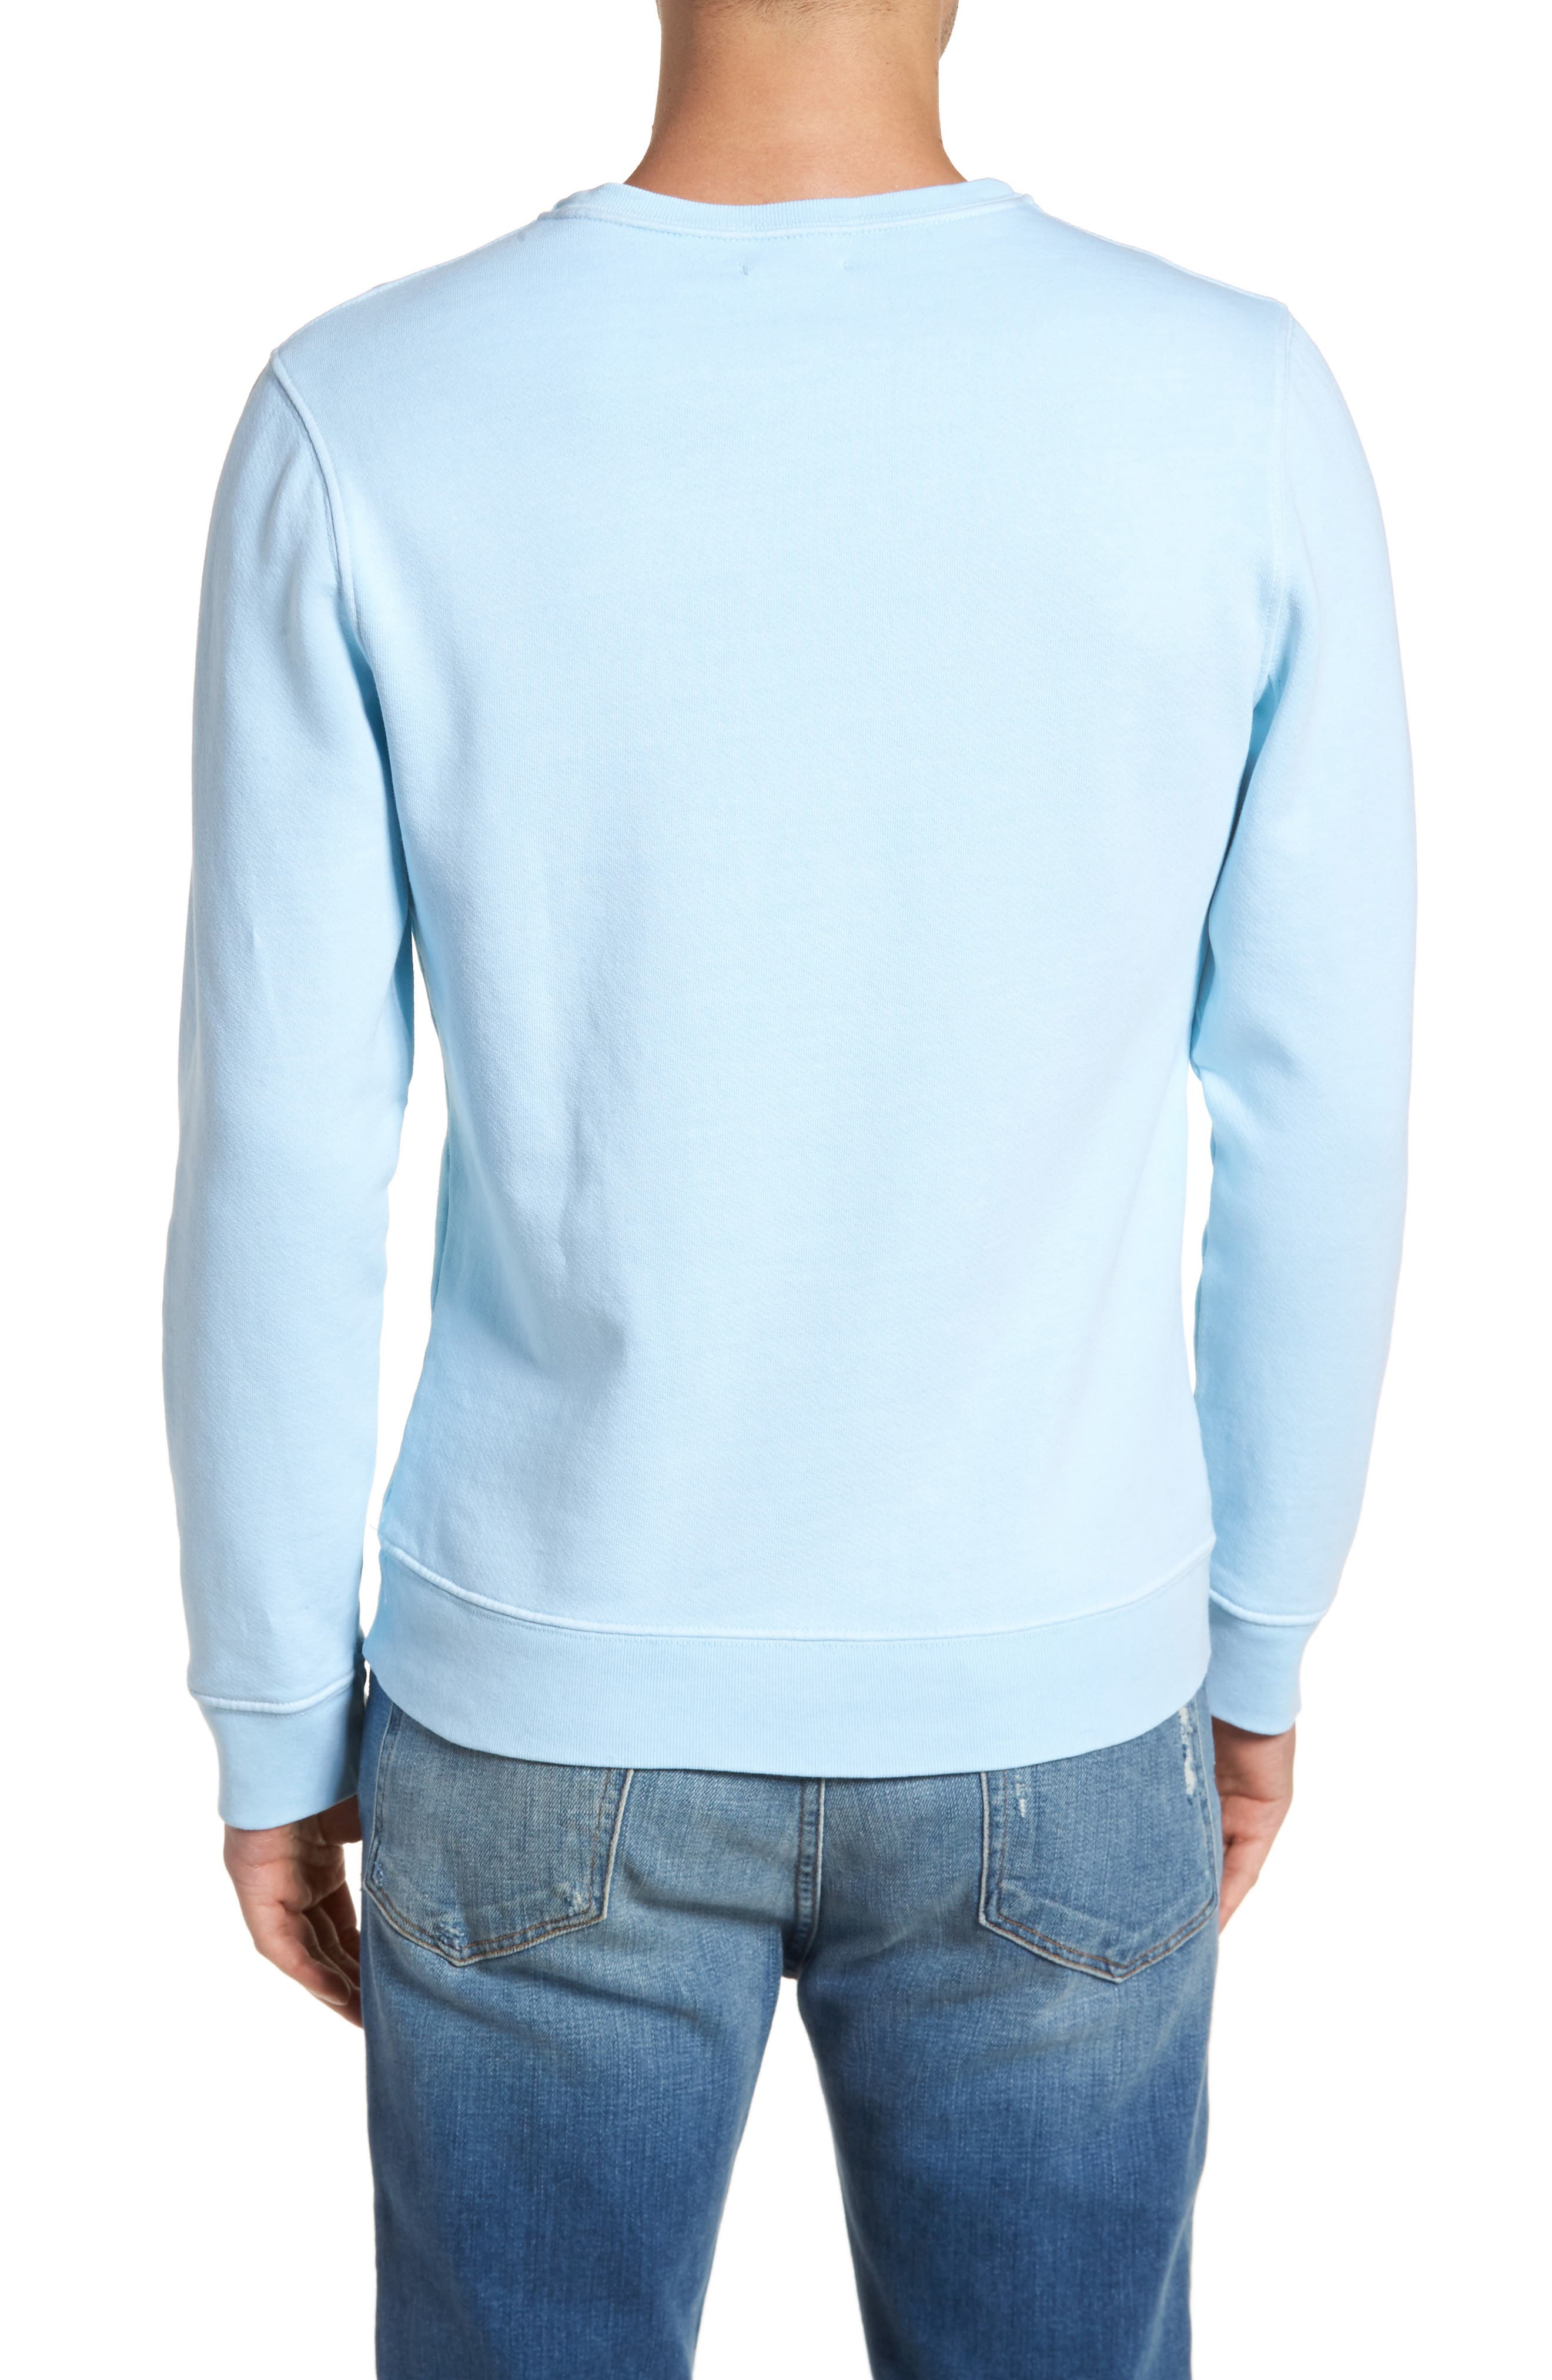 Vintage Crewneck Sweatshirt,                             Alternate thumbnail 2, color,                             400